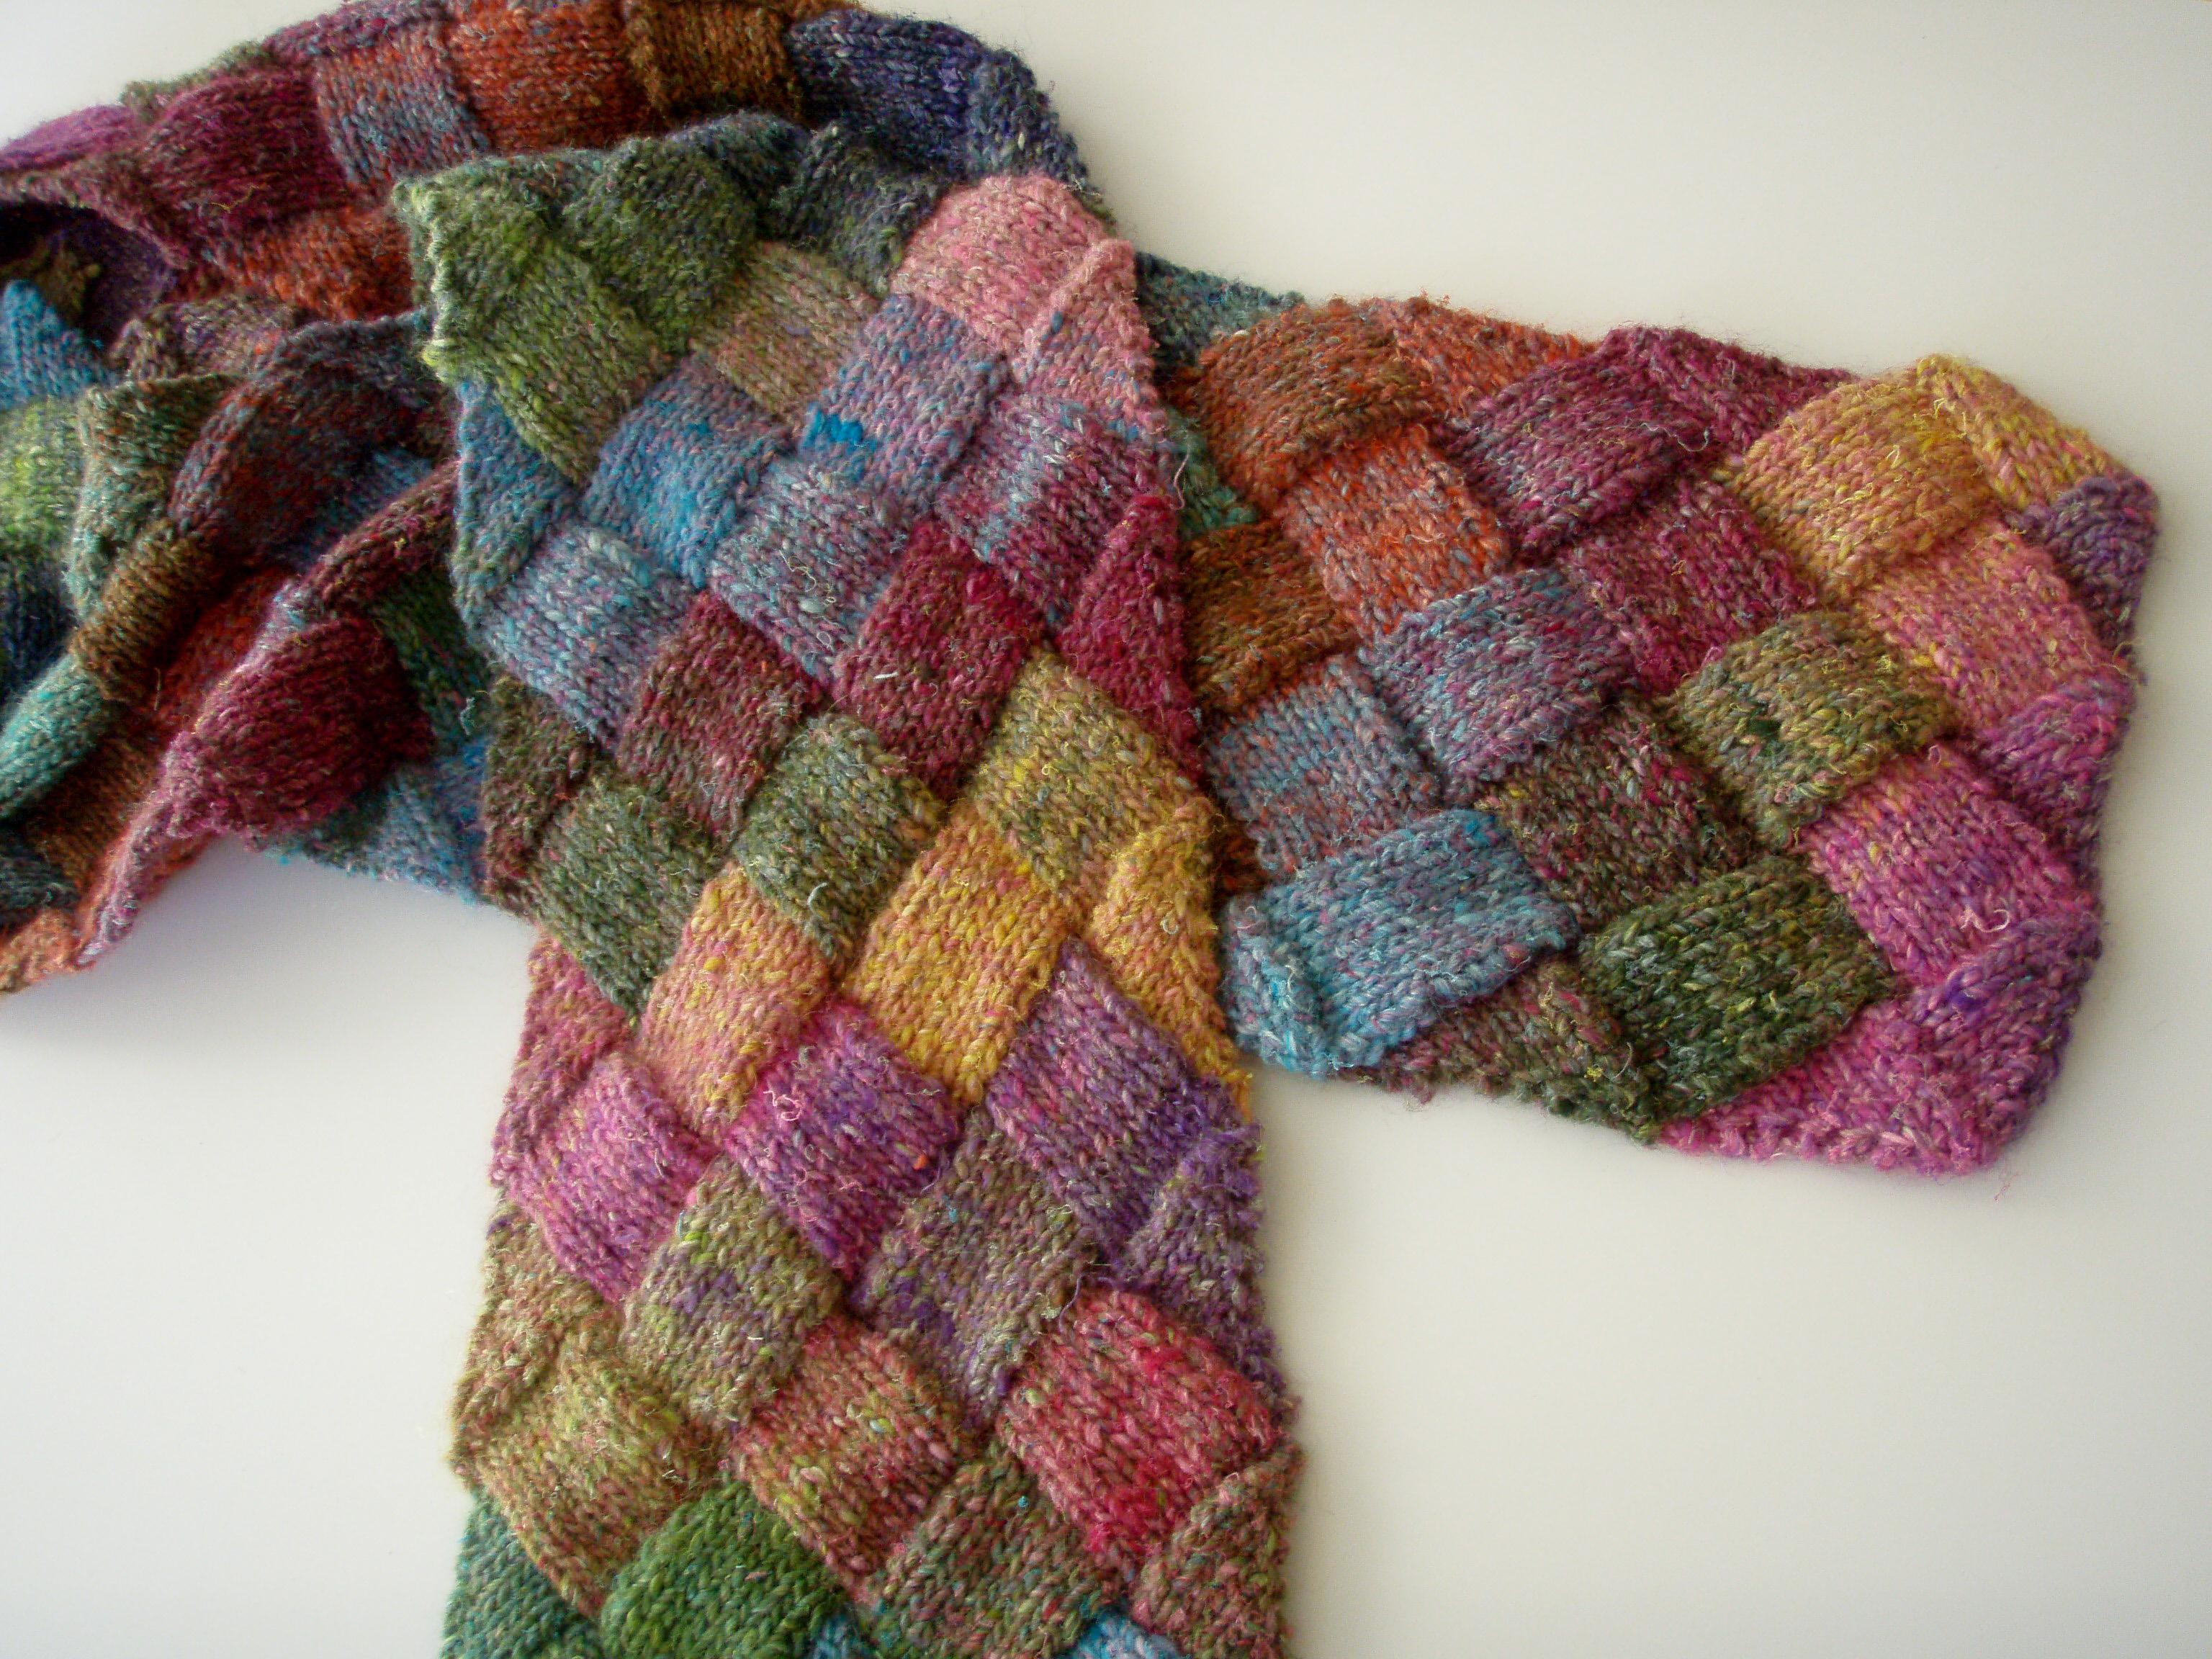 Free Knitting Patterns Entrelac Scarf : Entrelac Scarf   Freckles & Purls